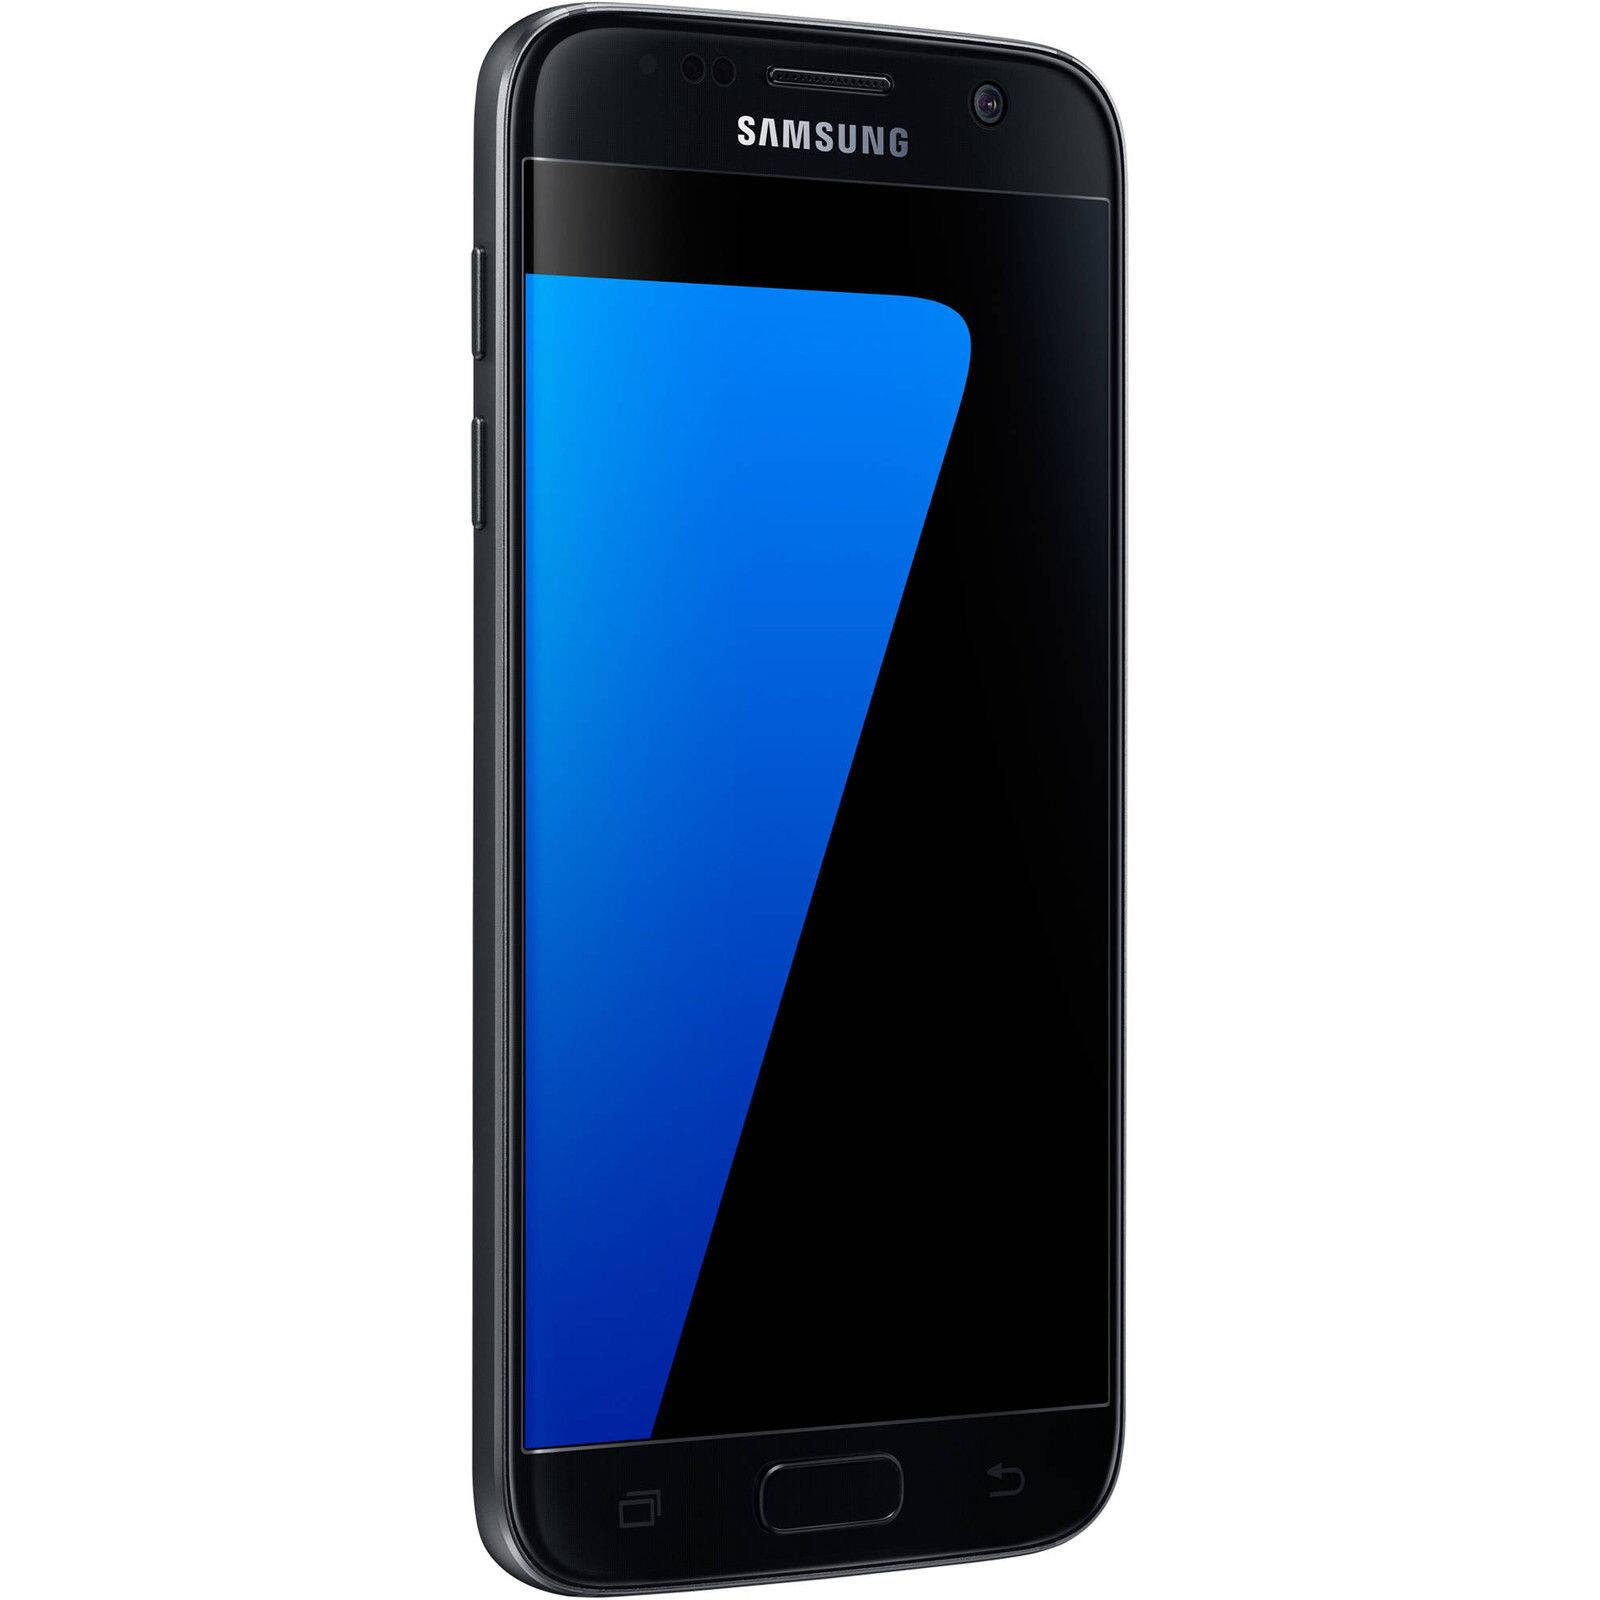 32GB Samsung Galaxy S7 GSM Unlocked 4G LTE Smartphone  $530 + Free Shipping